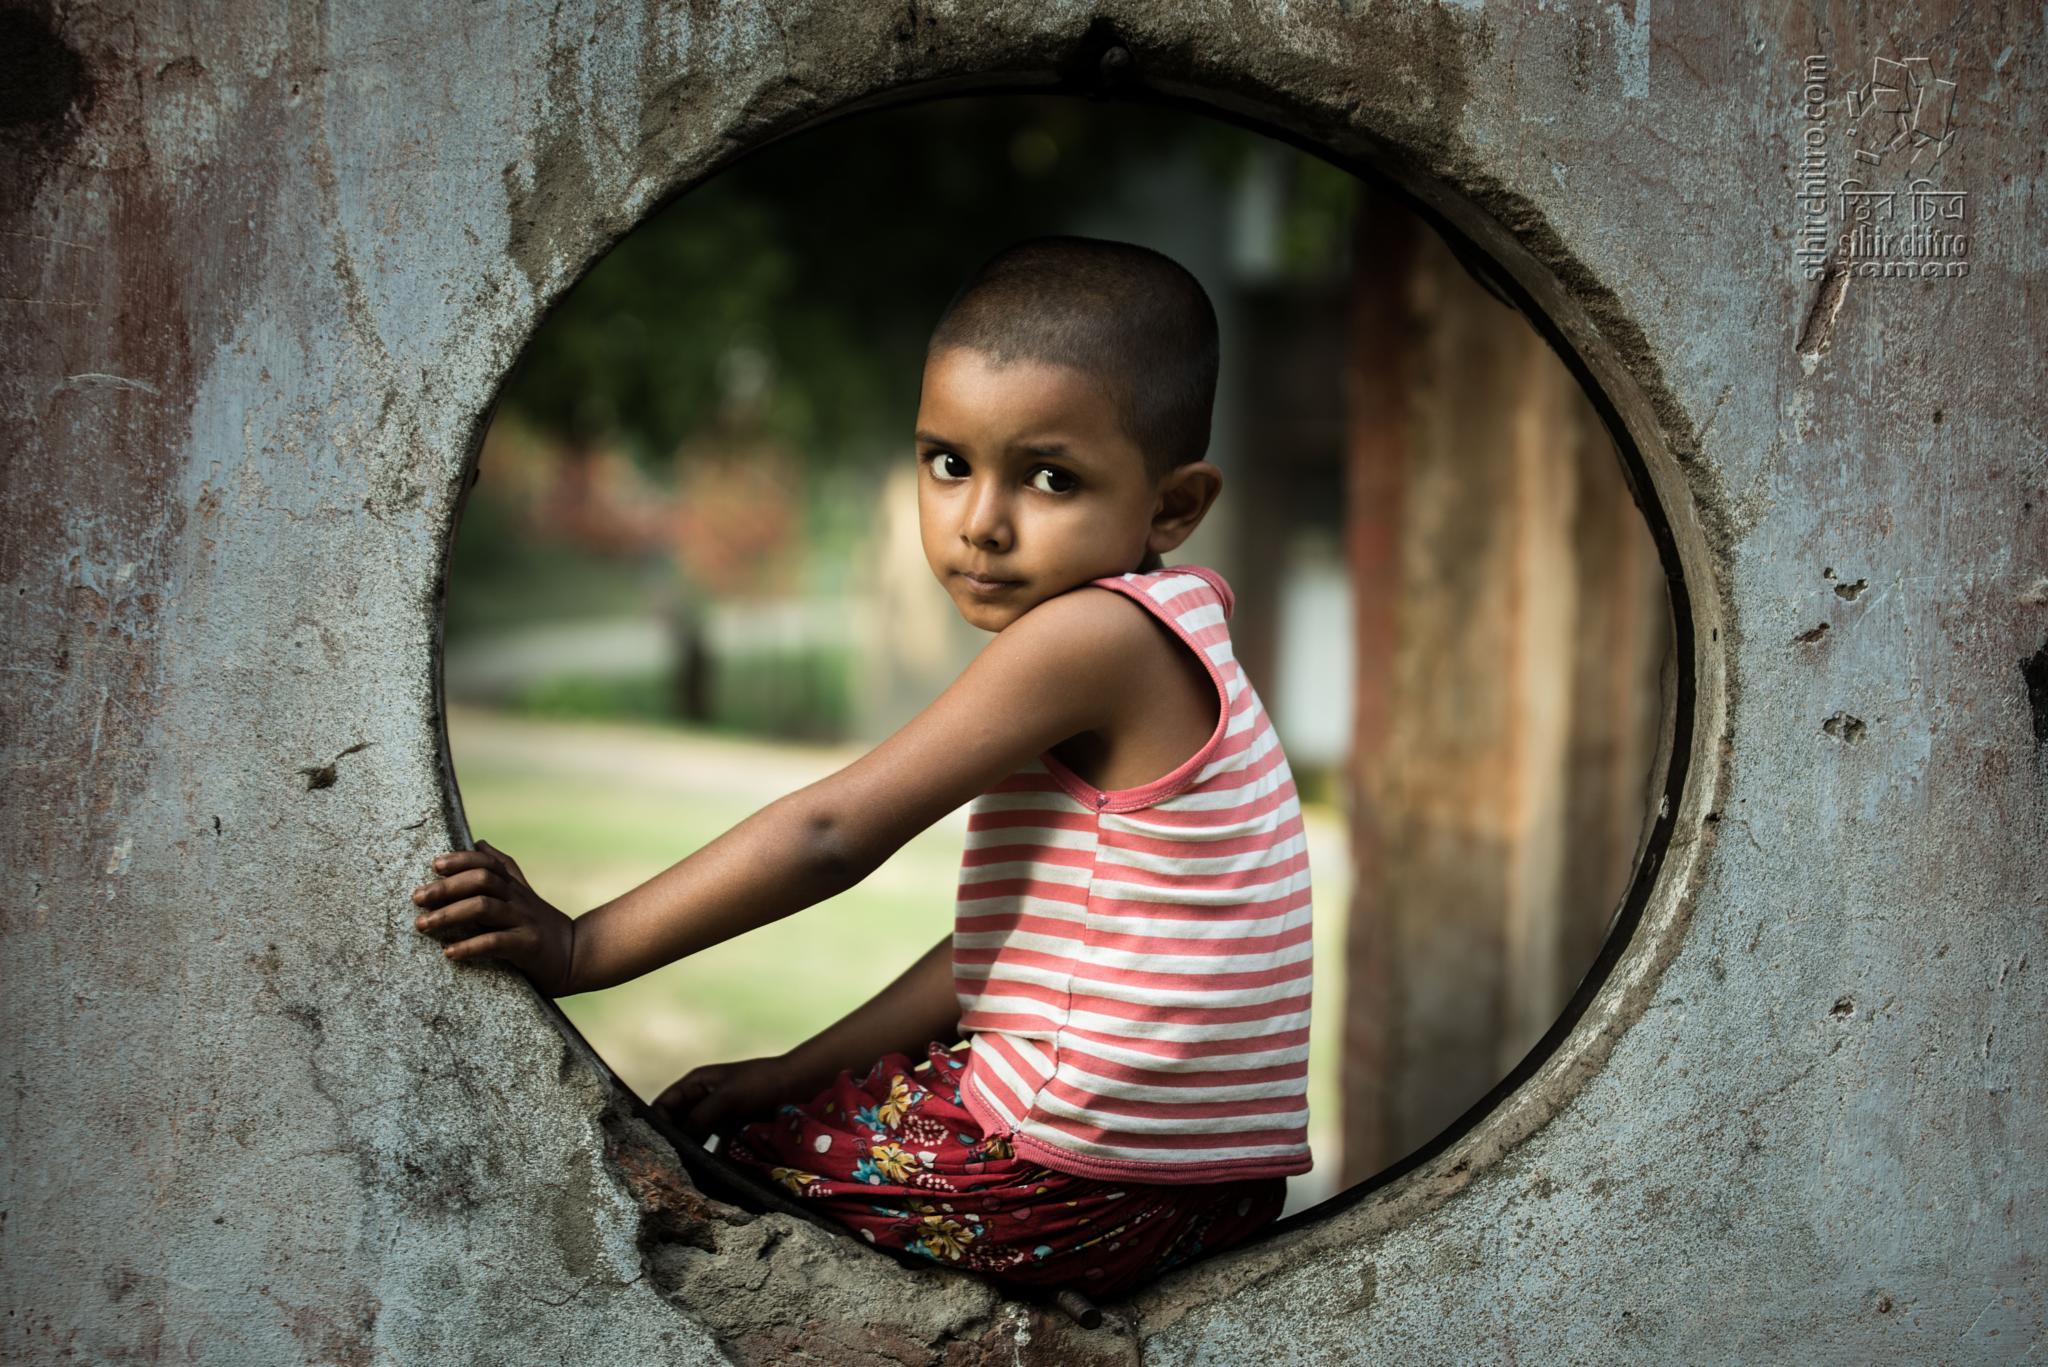 ... kid ... by shams xaman